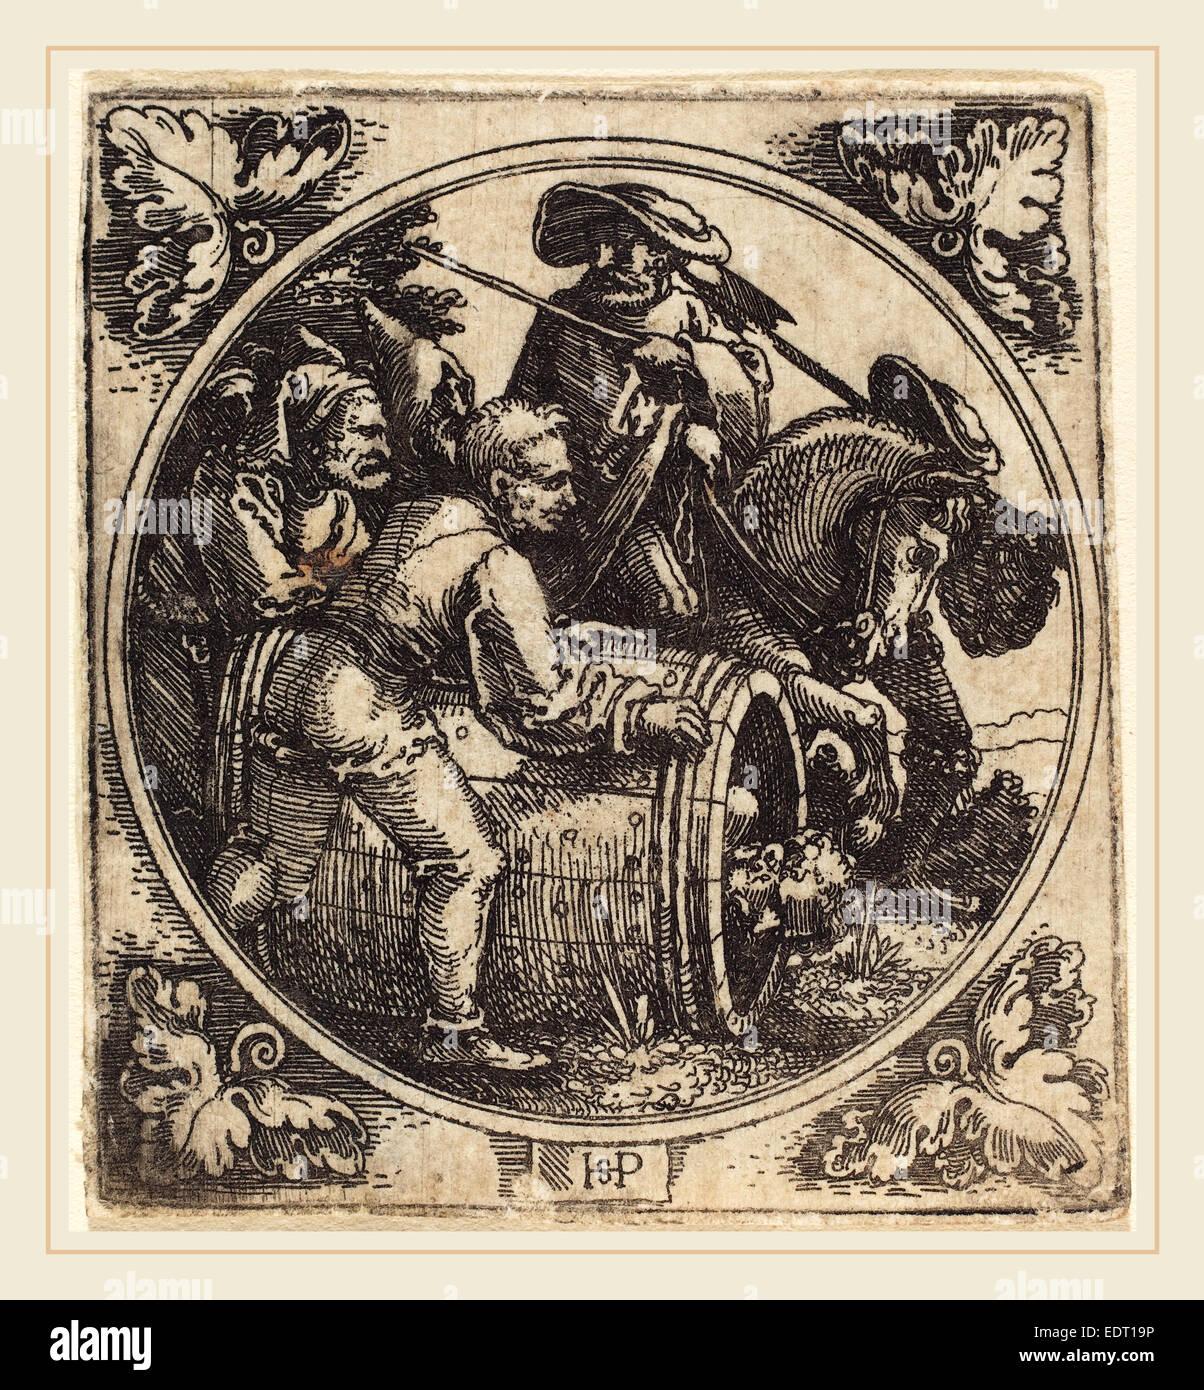 Sebald Beham (German, 1500-1550), Regulus, etching - Stock Image